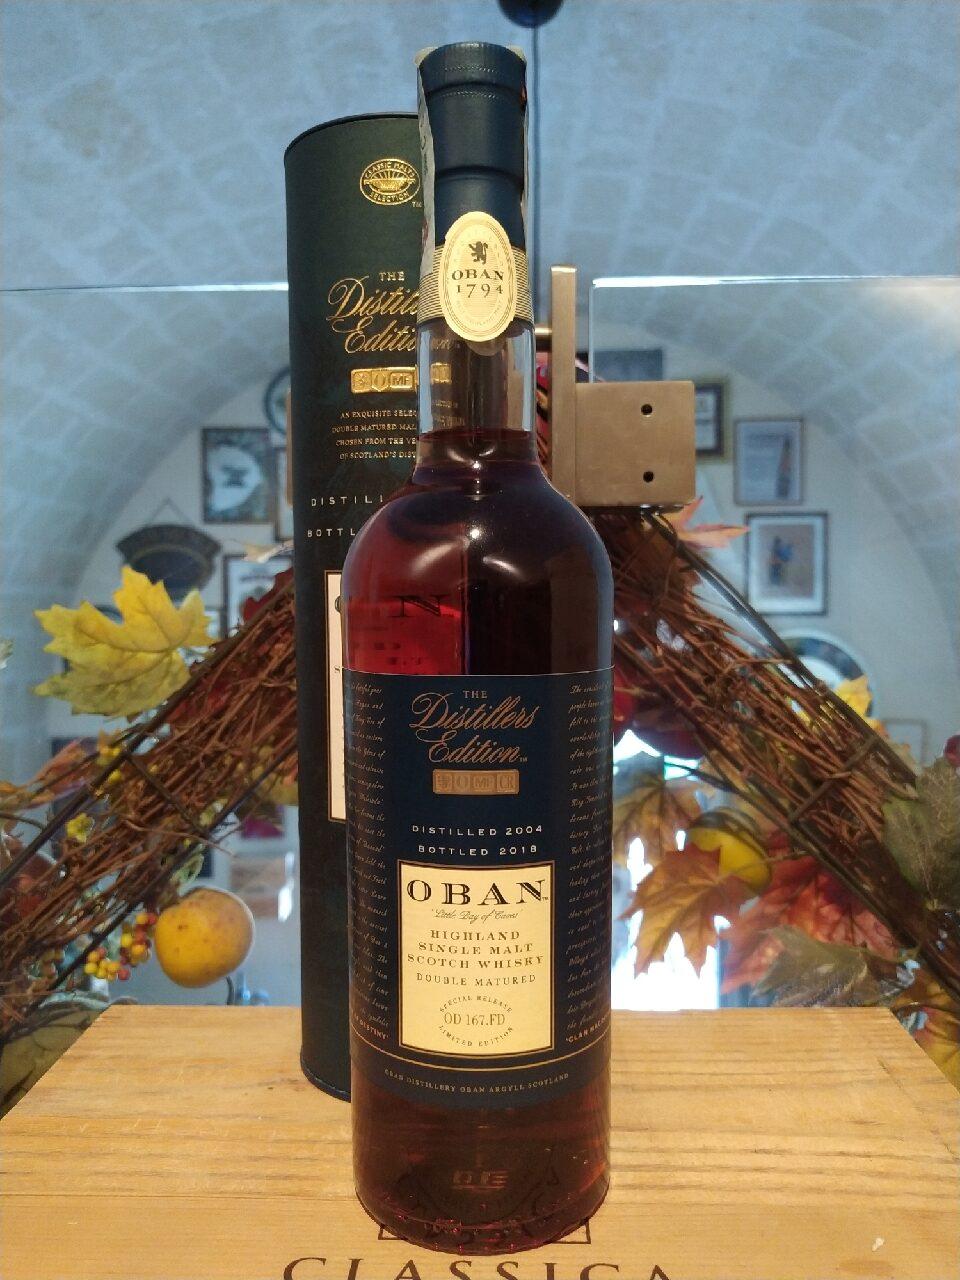 Oban Single Malt Scotch Whisky 2004 14 YO Distillers Edition 2018